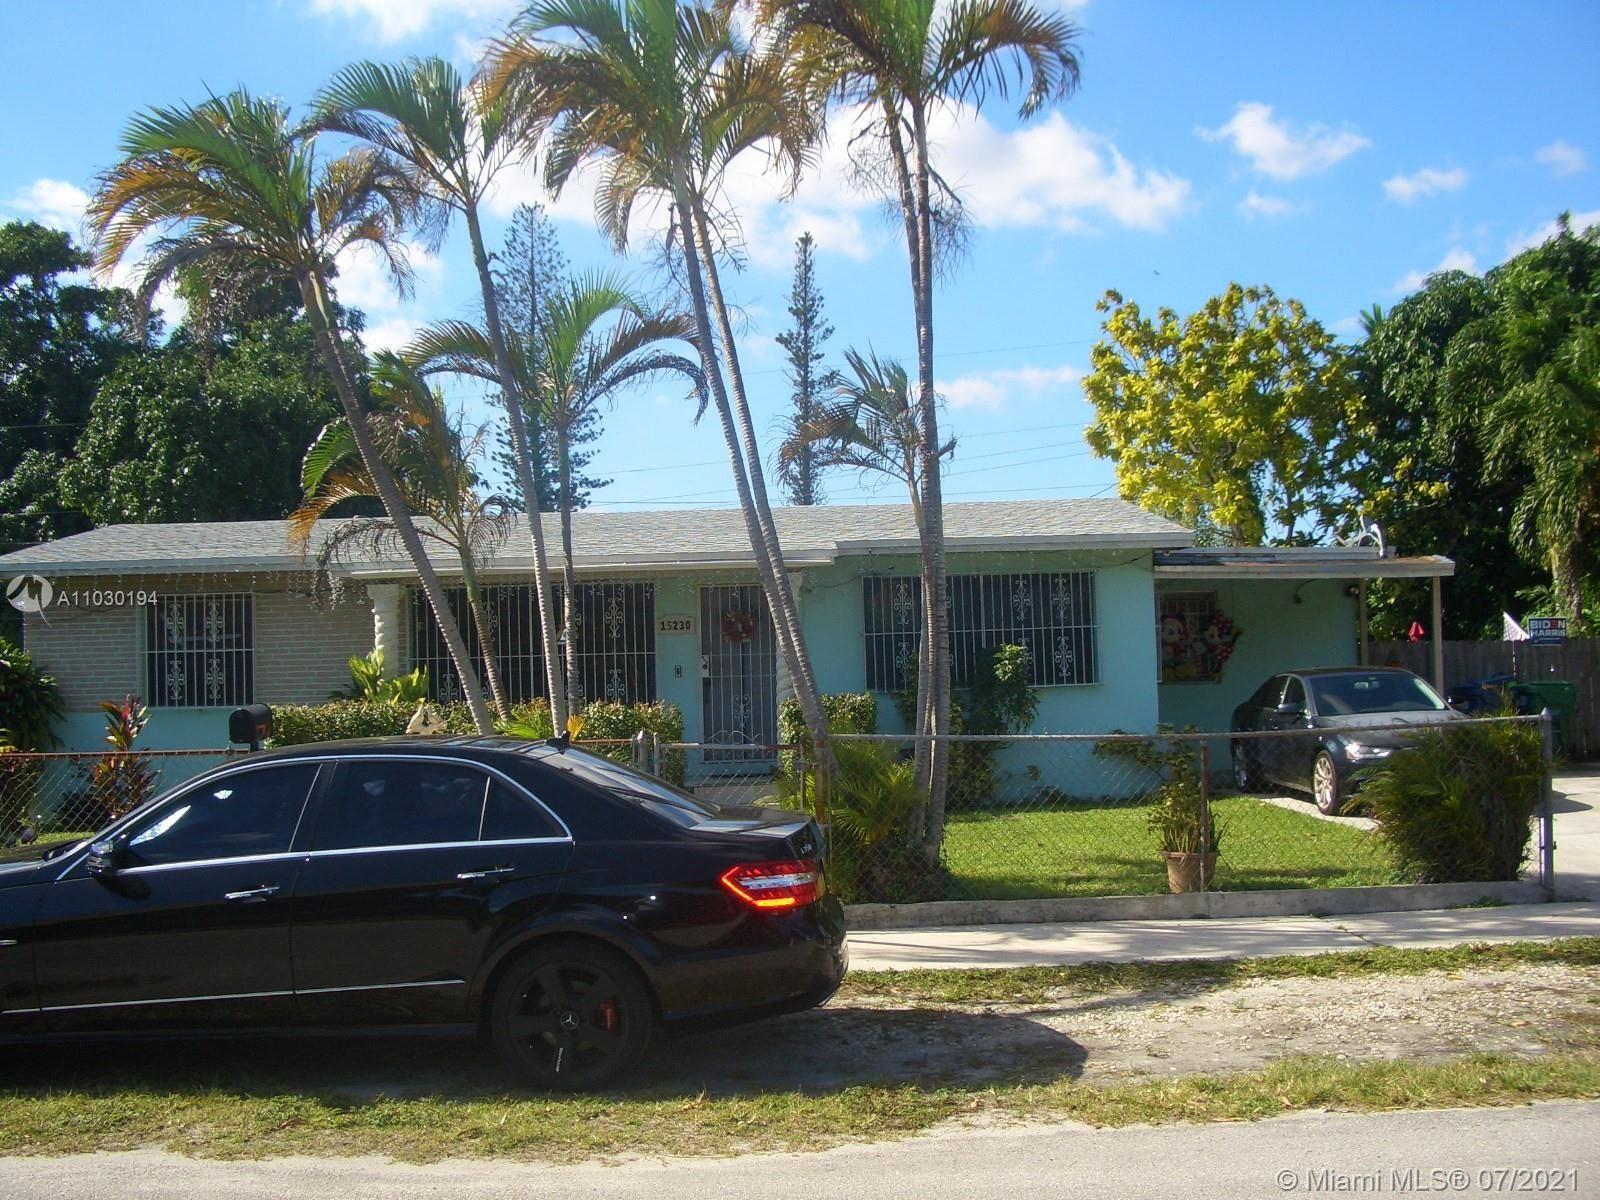 15230 NW 33rd Ave, Miami Gardens, FL 33054 - #: A11030194